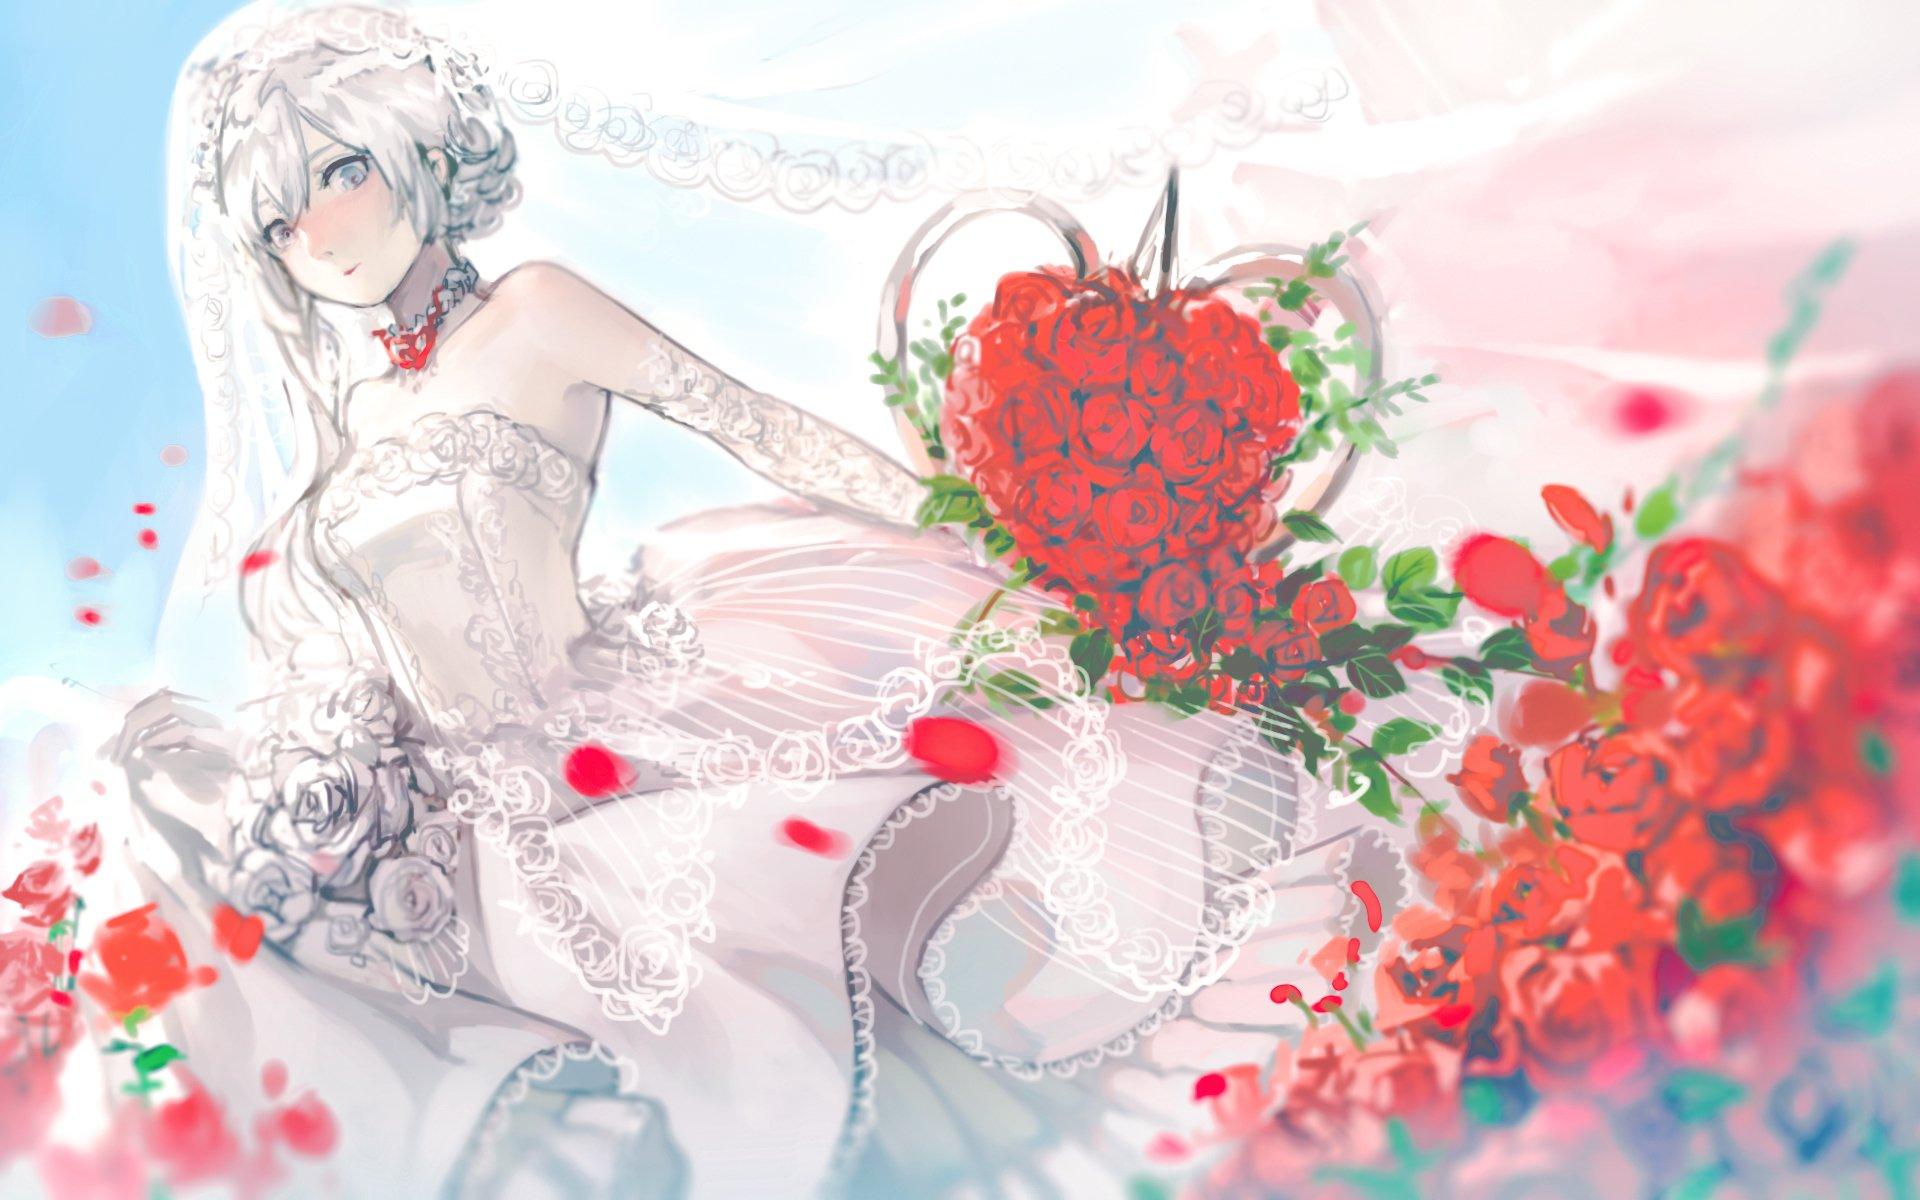 3 Snow White (SINoALICE) HD Wallpapers